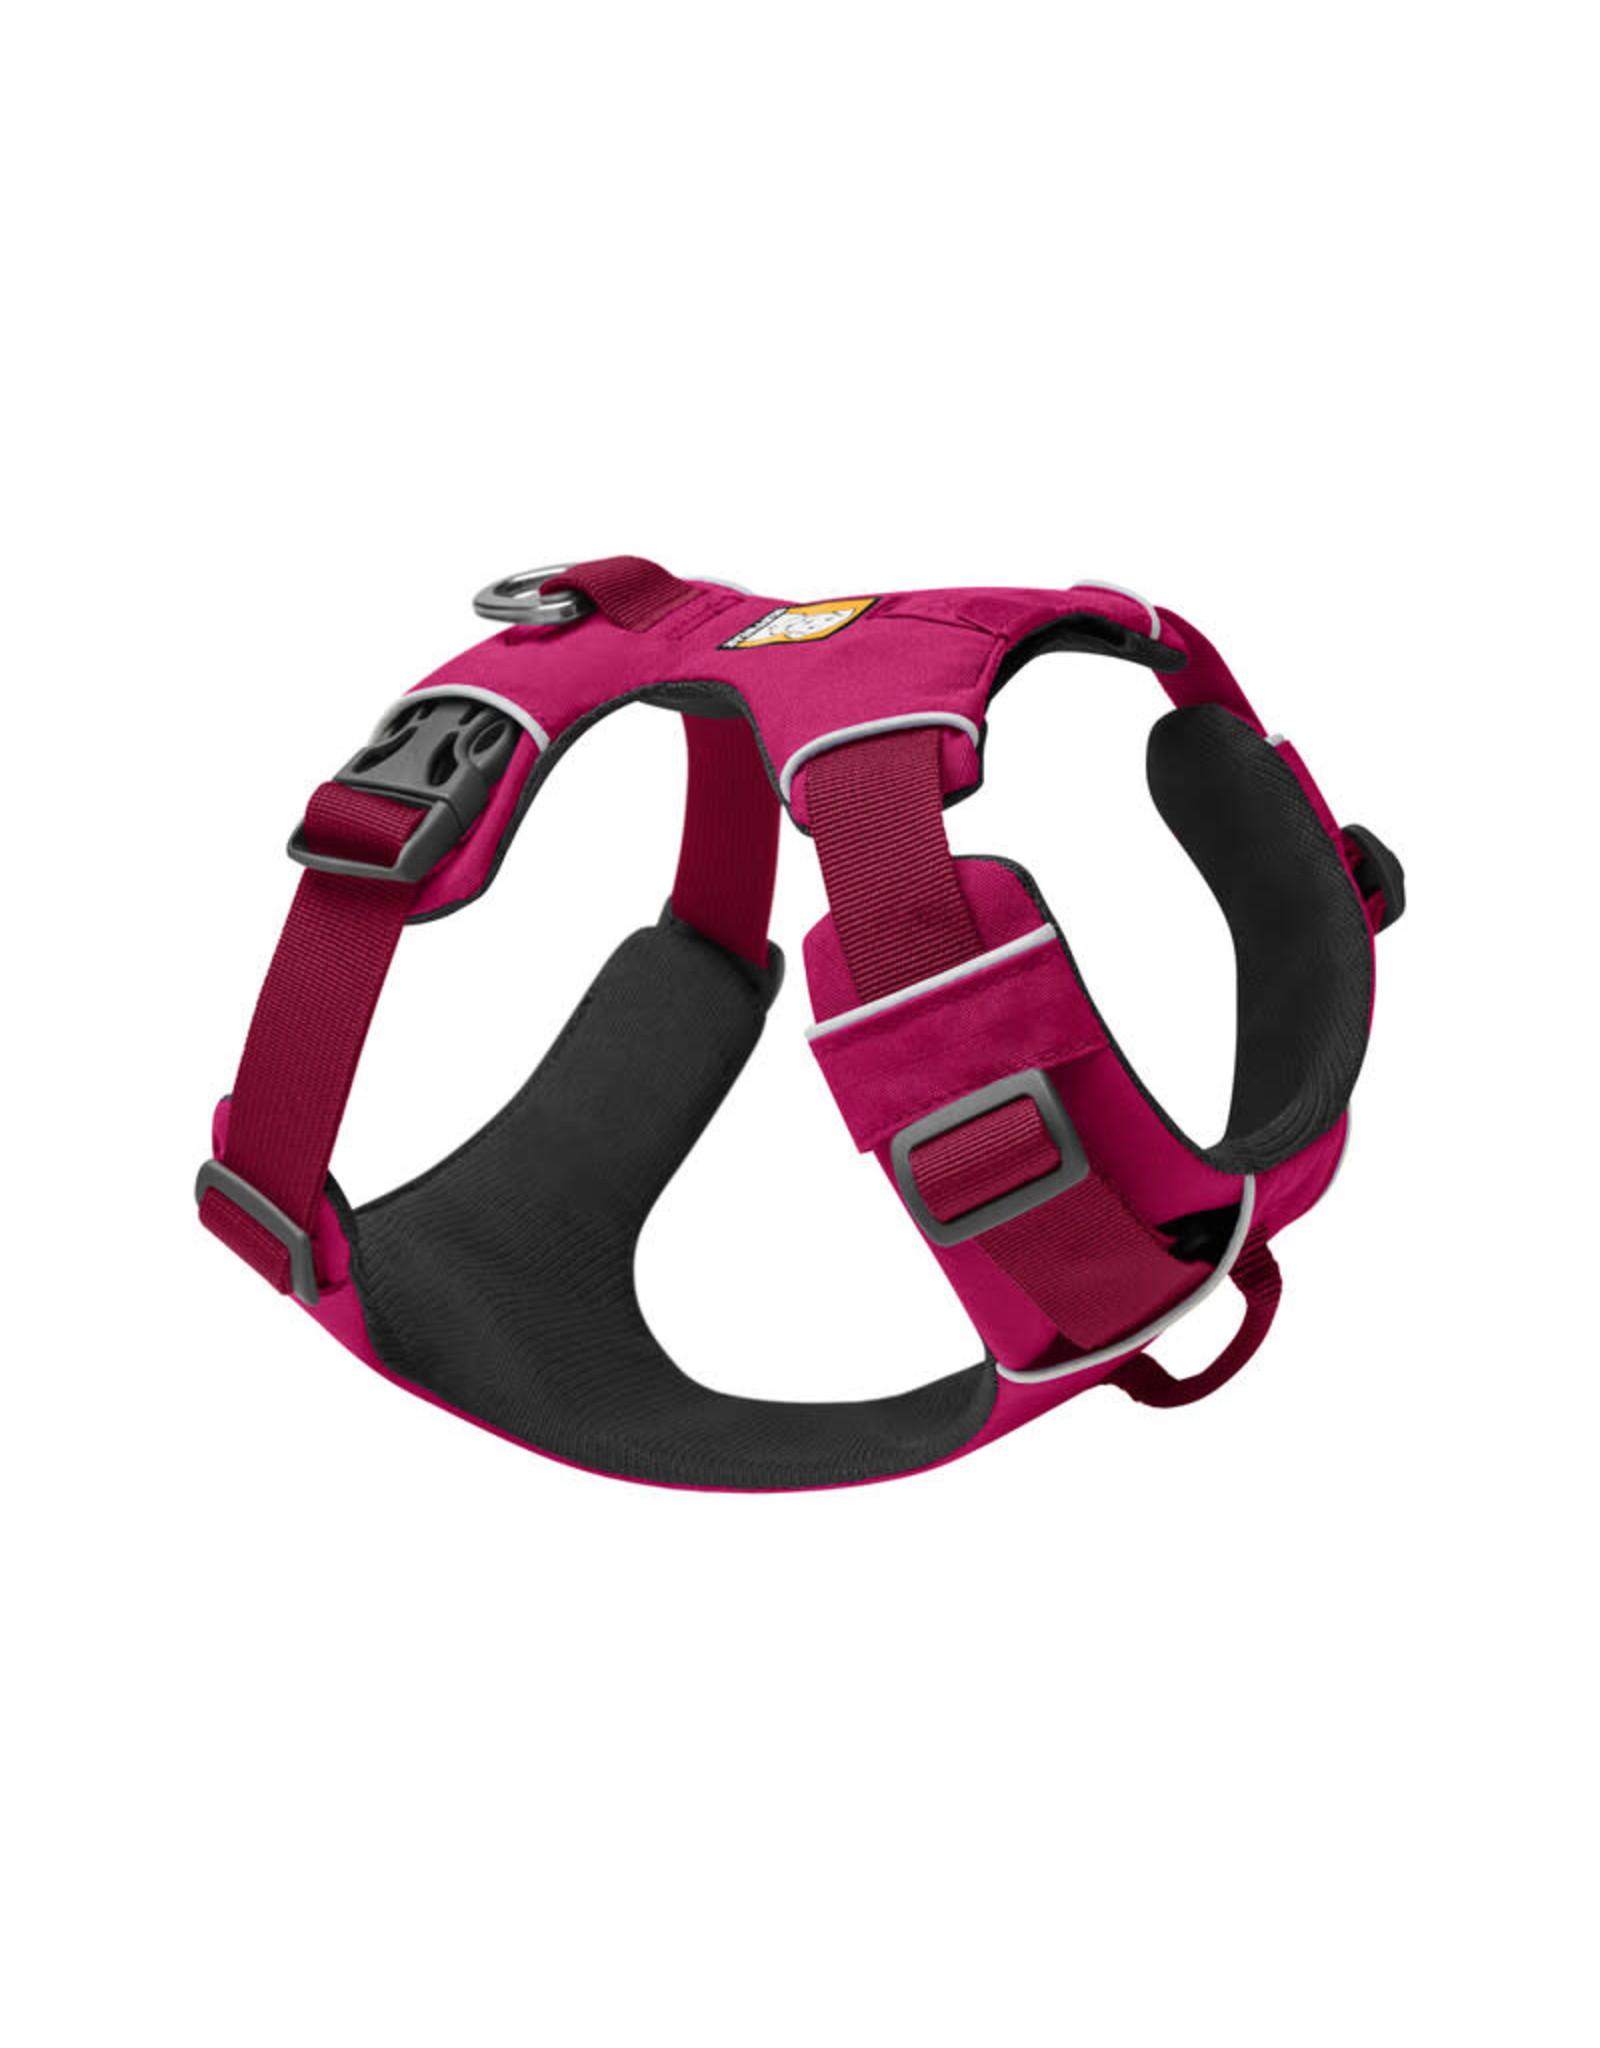 Ruffwear Front Range Harness: Hibiscus Pink, L/XL